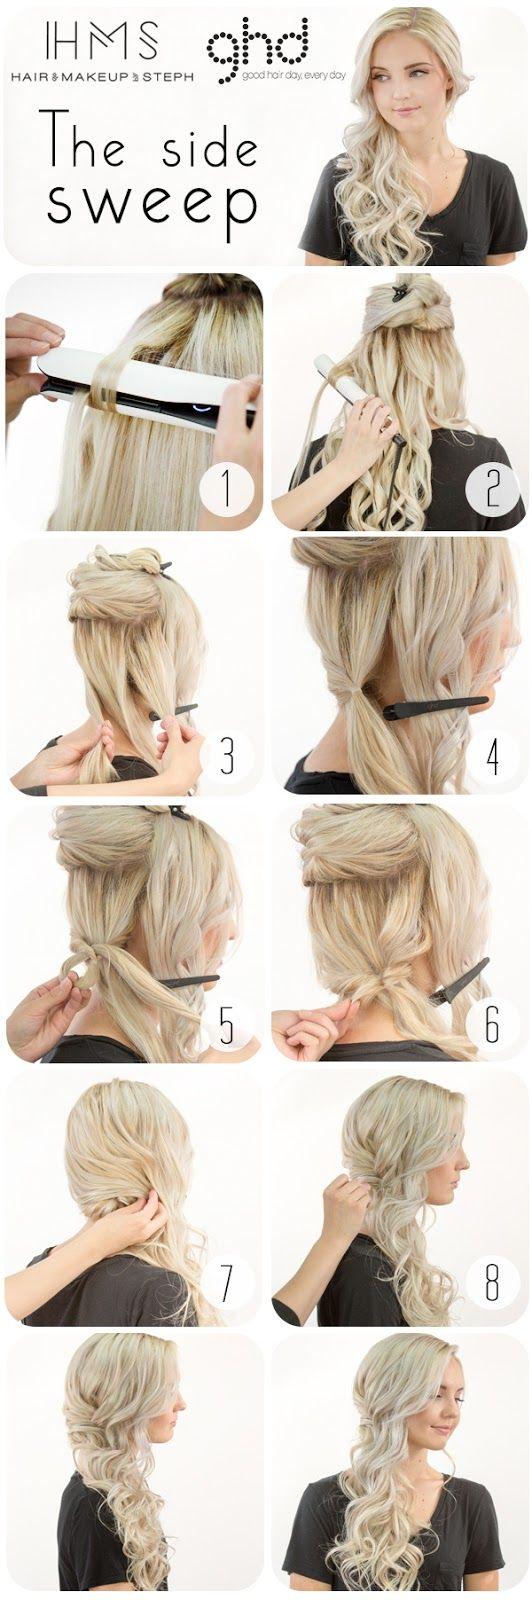 25+ best ball hair ideas on pinterest | messy updo, ball